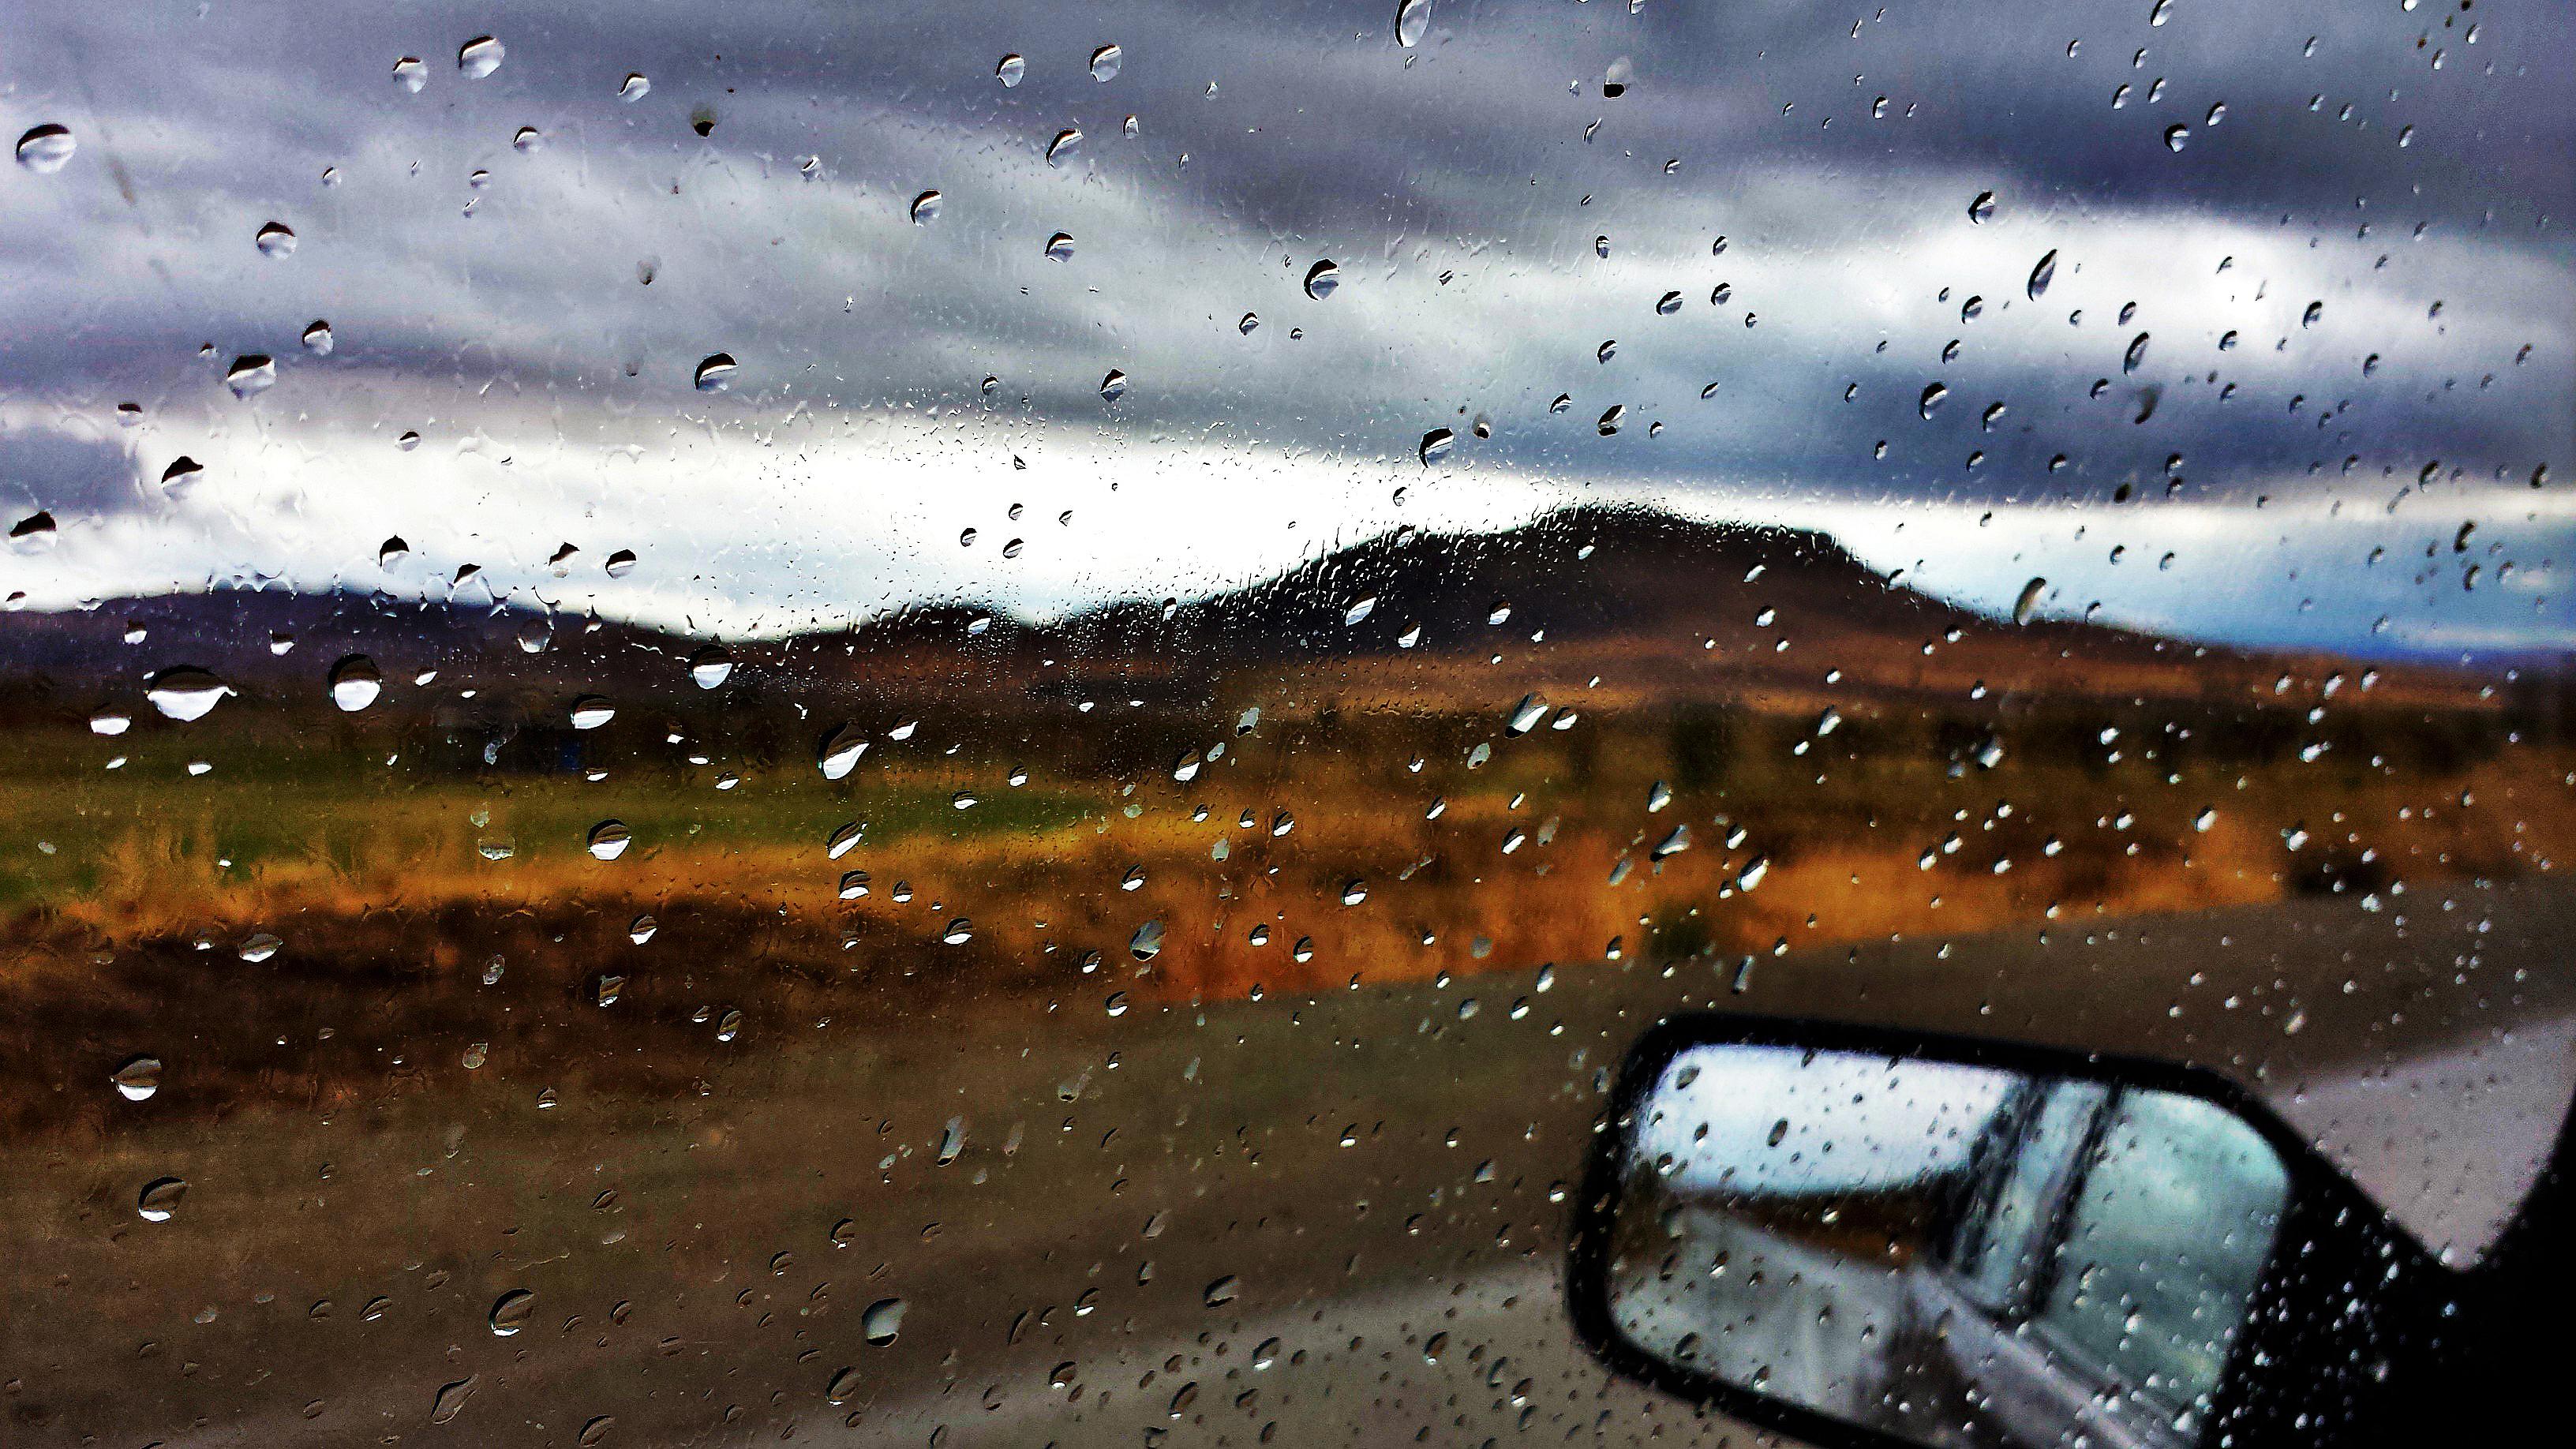 Autumn Rain Full Hd Wallpaper And Background 3264x1836